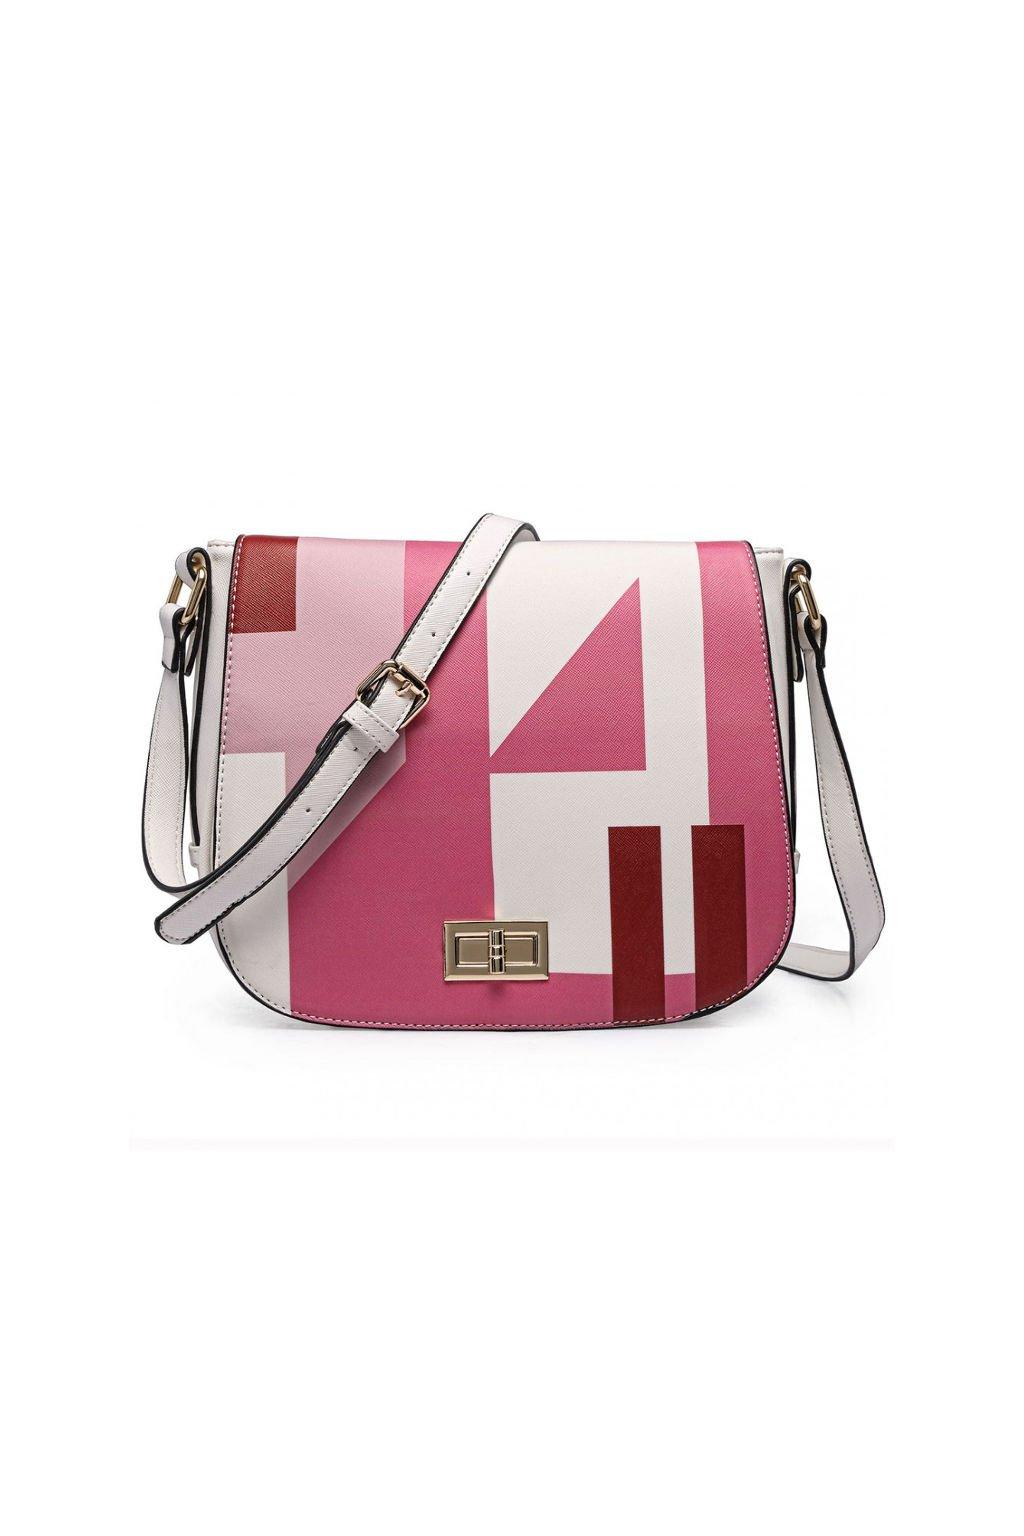 Bílá crossbody kabelka Miss Lulu s růžovým potiskem LT1663